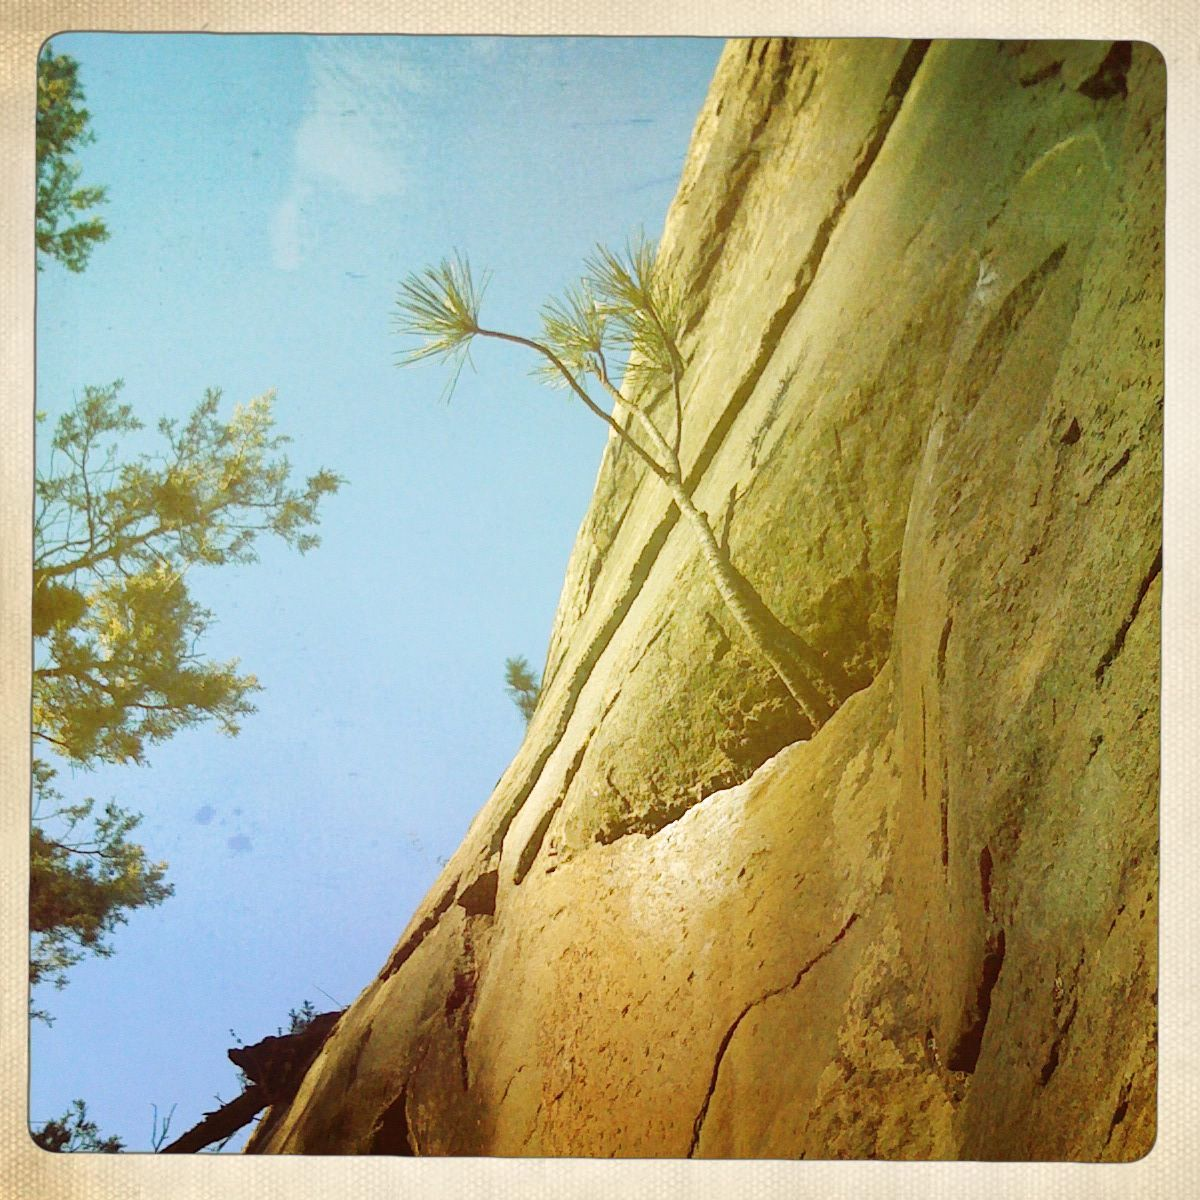 Ponderosa growing out of a rock wall. Taken in Bend, Oregon. Love ...